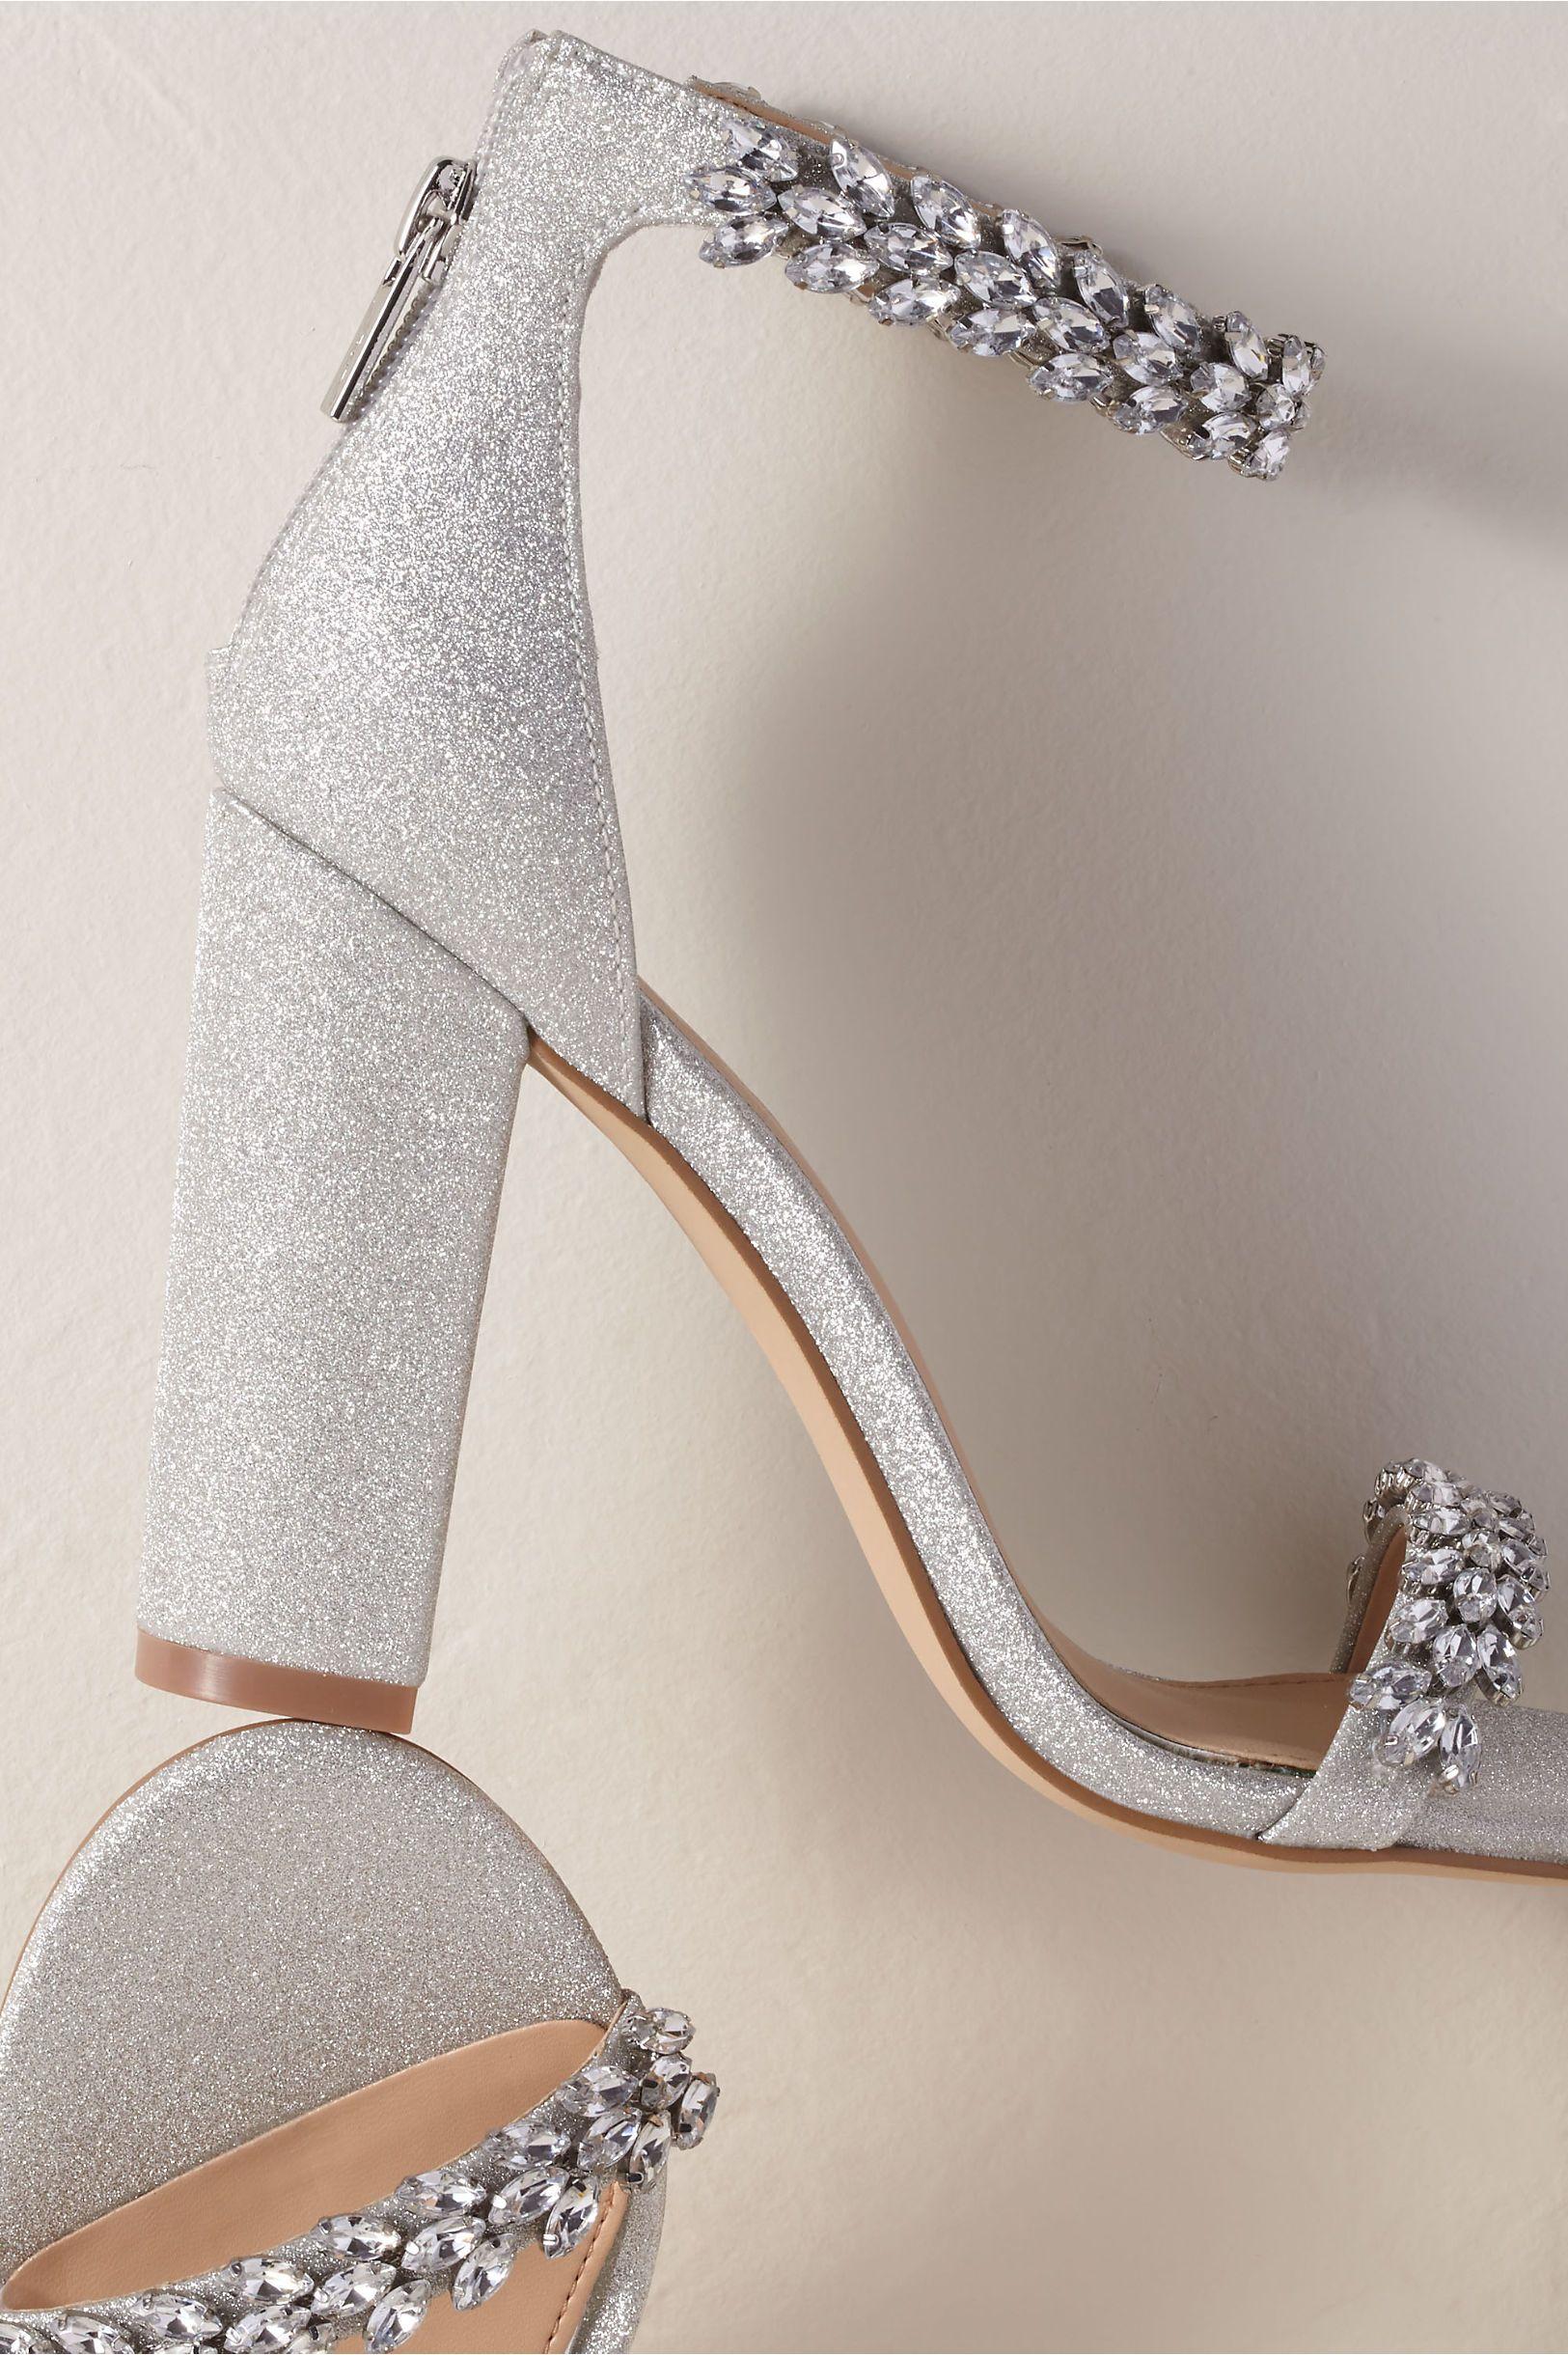 Jewel By Badgley Mischka Mayra Block Heels Bridal Shoes Silver Heels Wedding Shoes